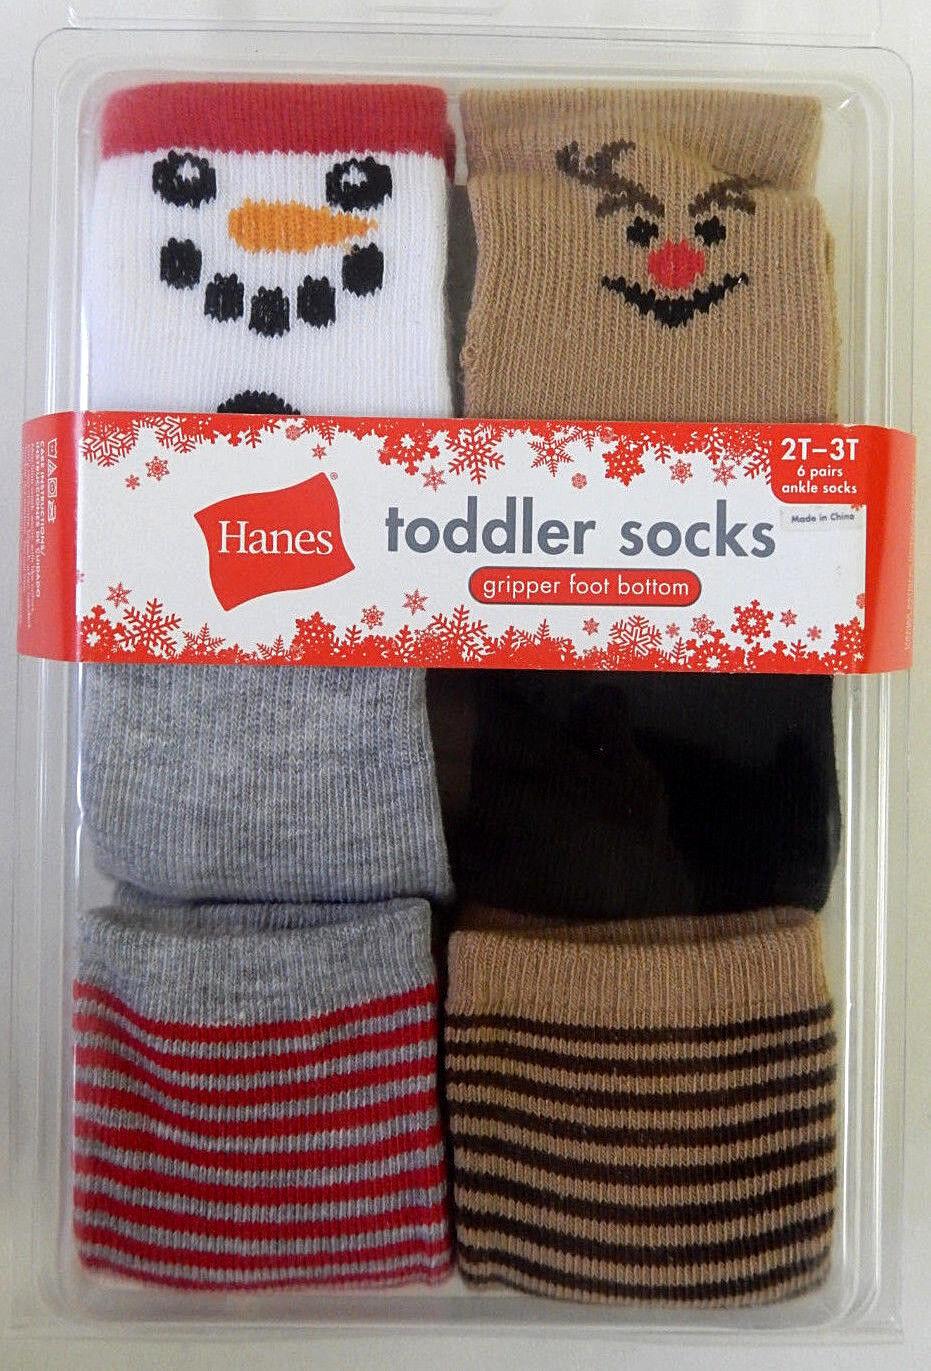 Hanes 12 24 Months 2T 3T 4T 5T 6-pk Ankle Socks Toddler Boy